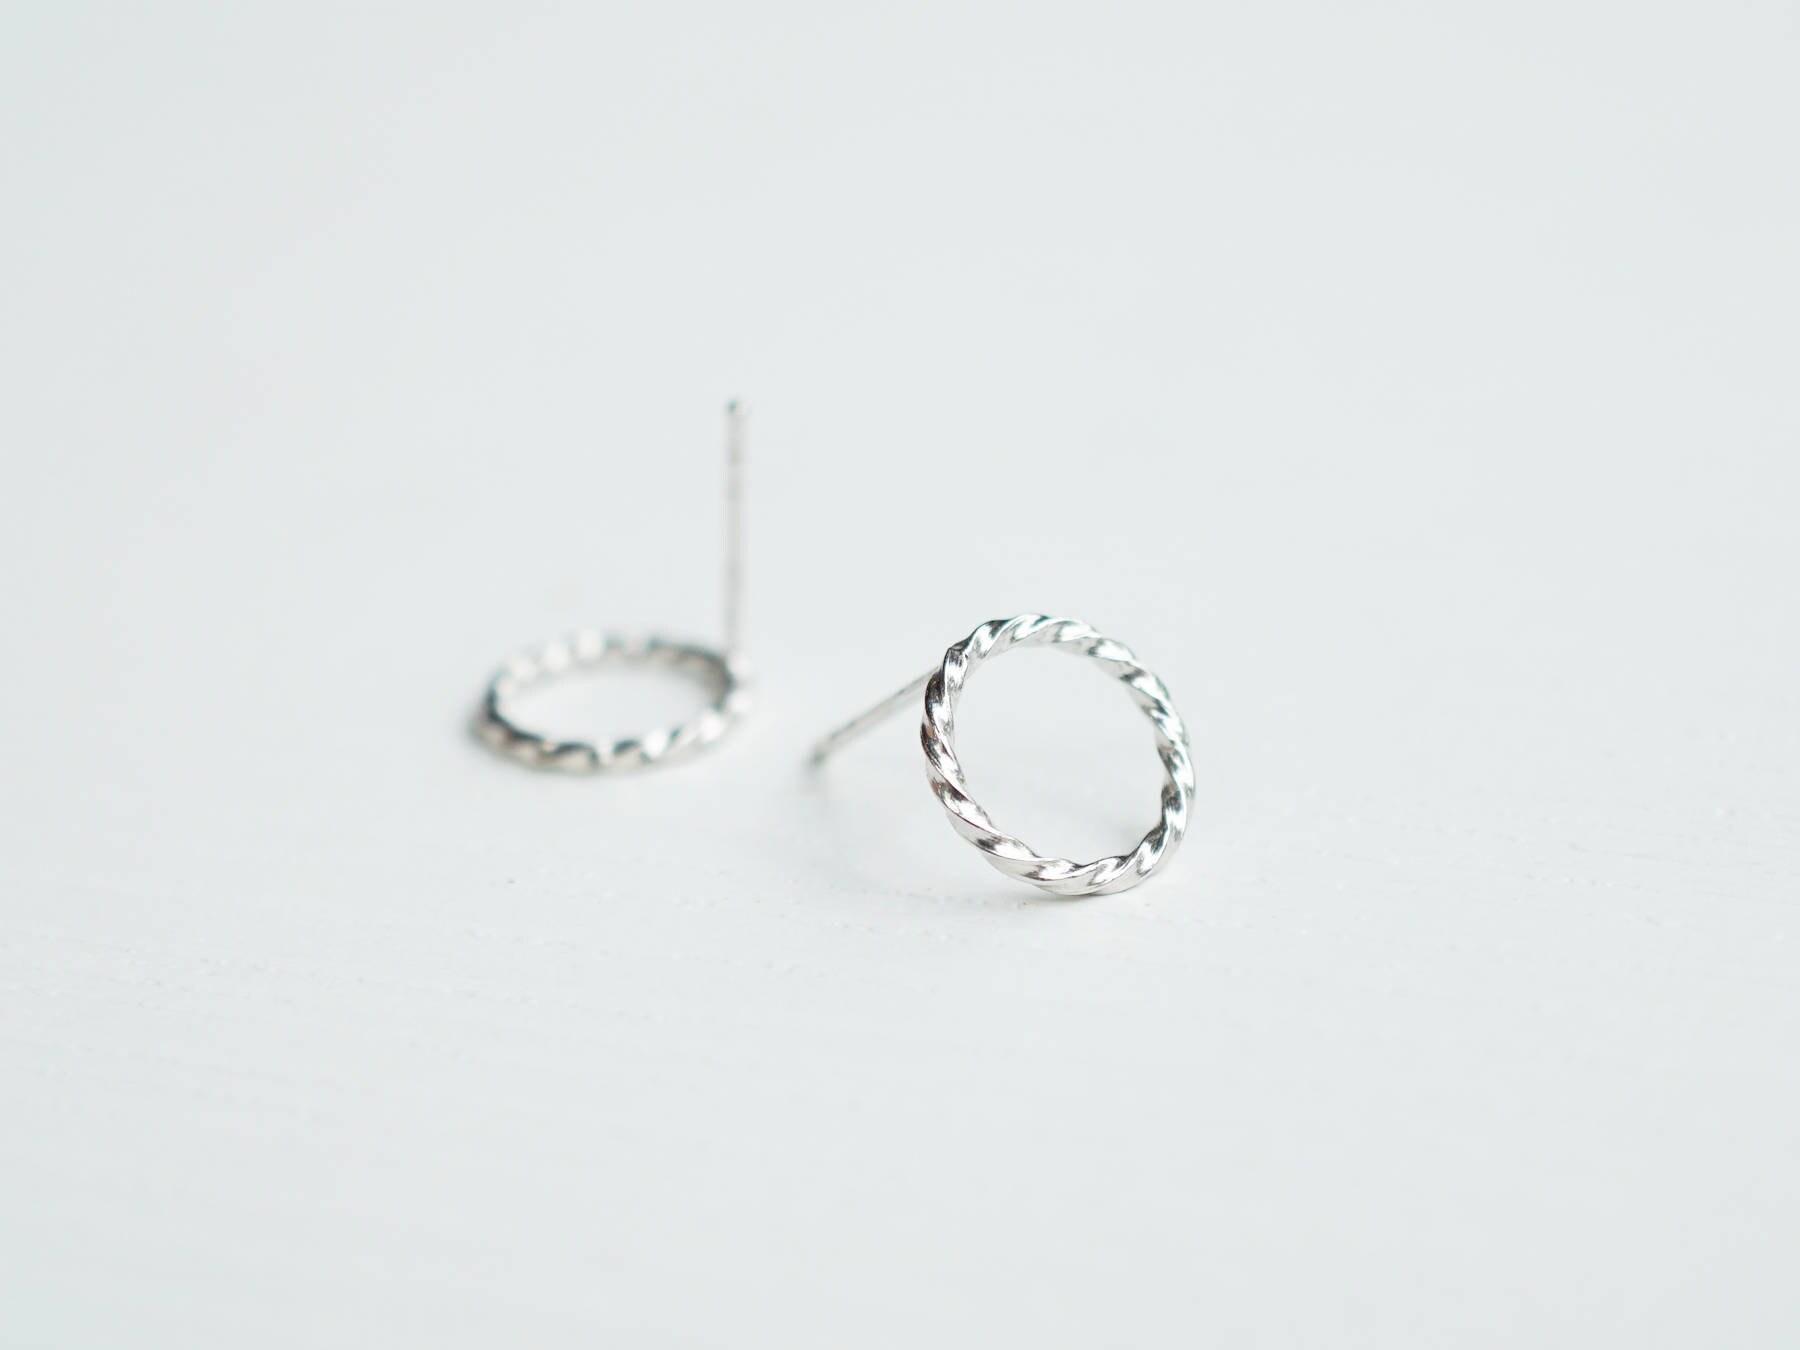 8efbd4641 Silver Twisted Circles Studs Rope Twist Stud Earrings Karma   Etsy